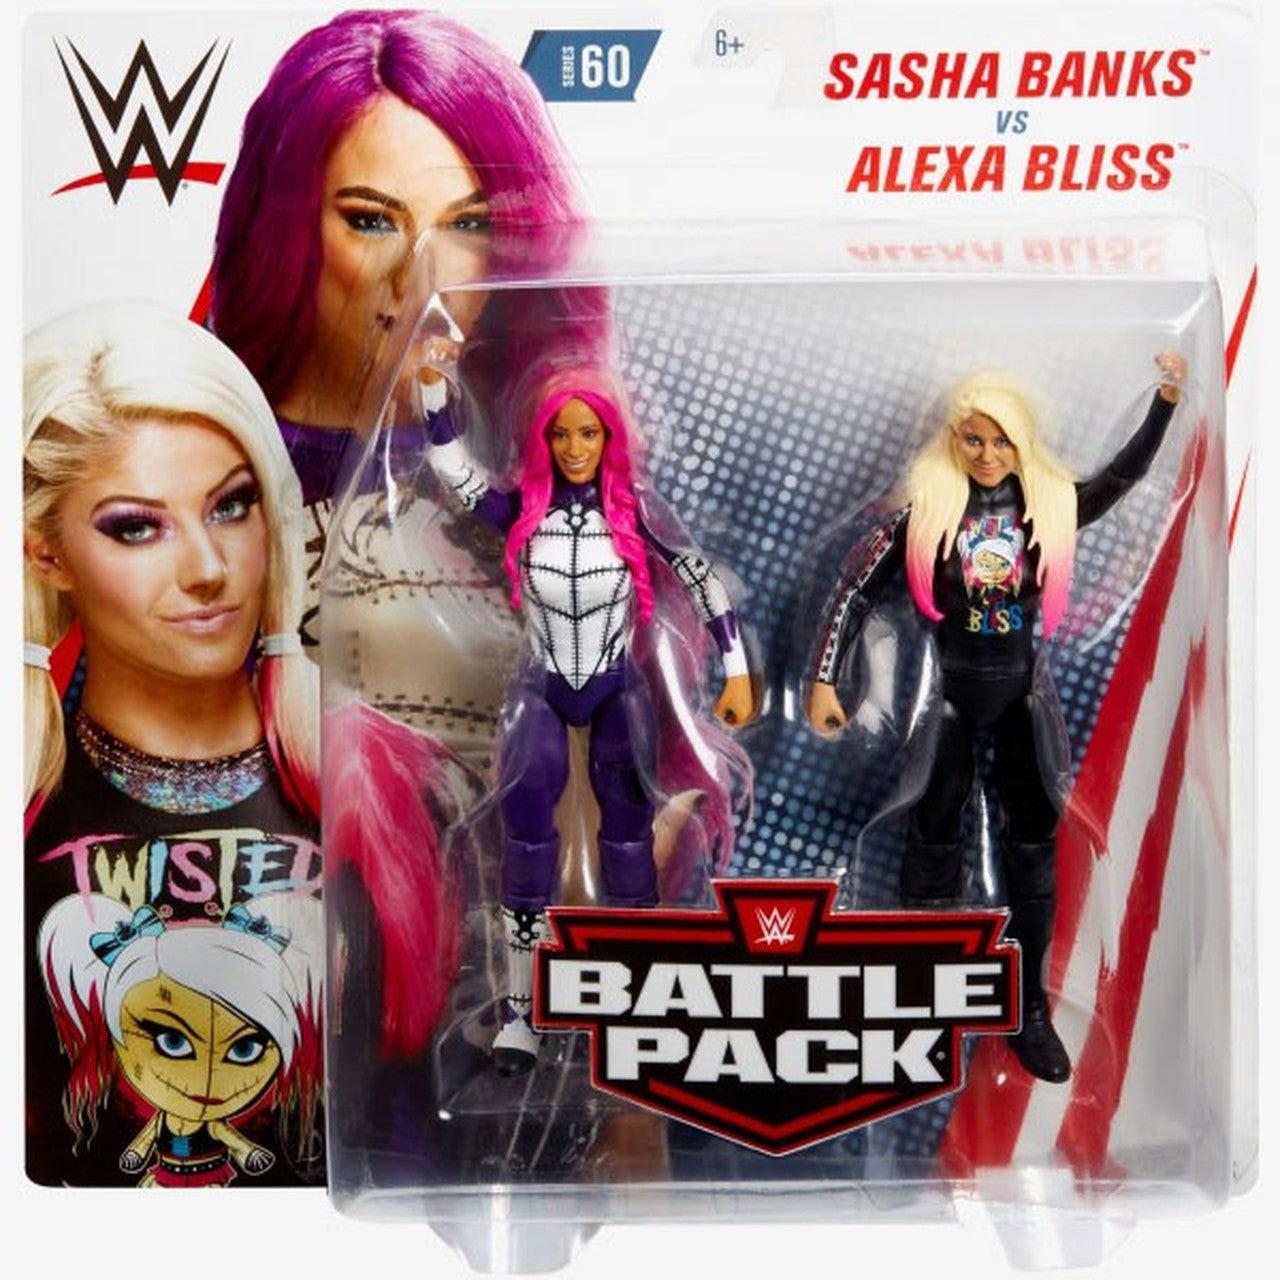 Image of WWE Battle Packs Series 60 - Sasha Banks & Alexa Bliss